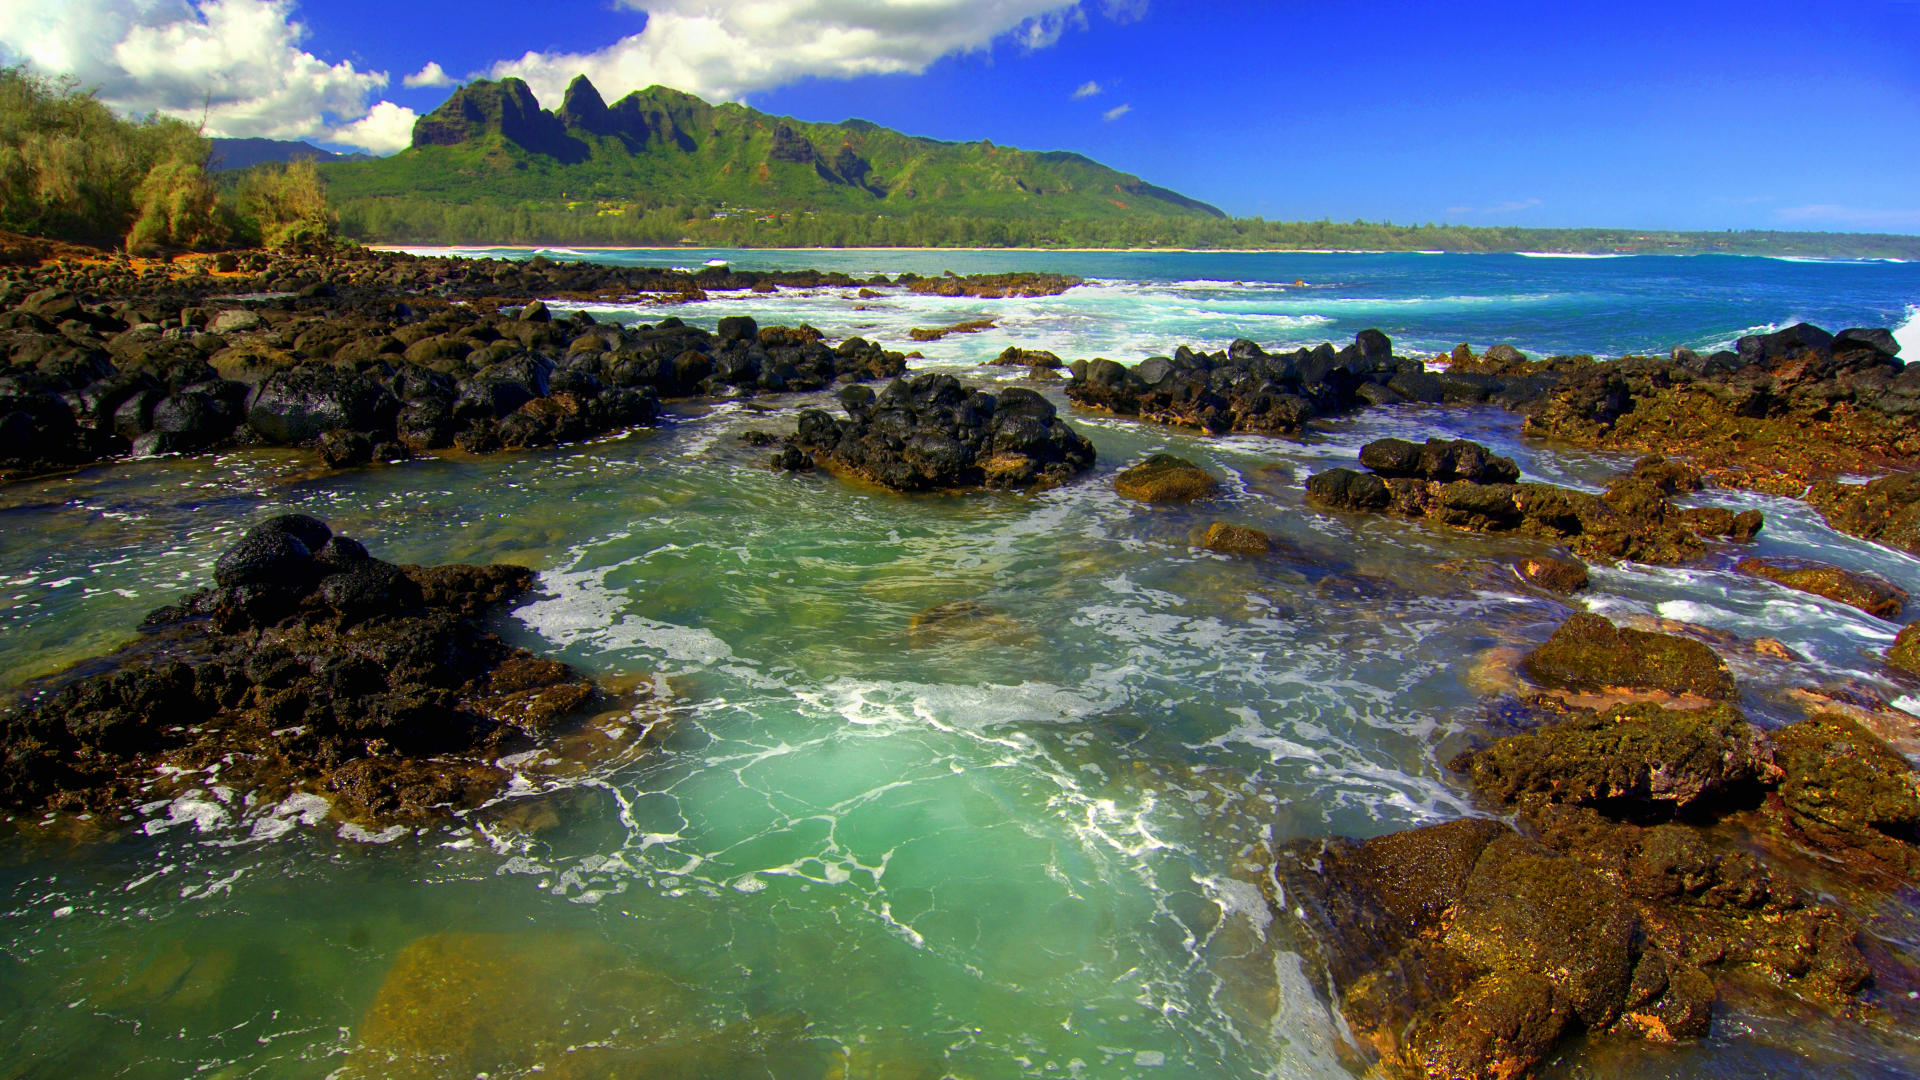 Kong Mountain Seascape Kauai   Cool Backgrounds and Wallpapers 1920x1080